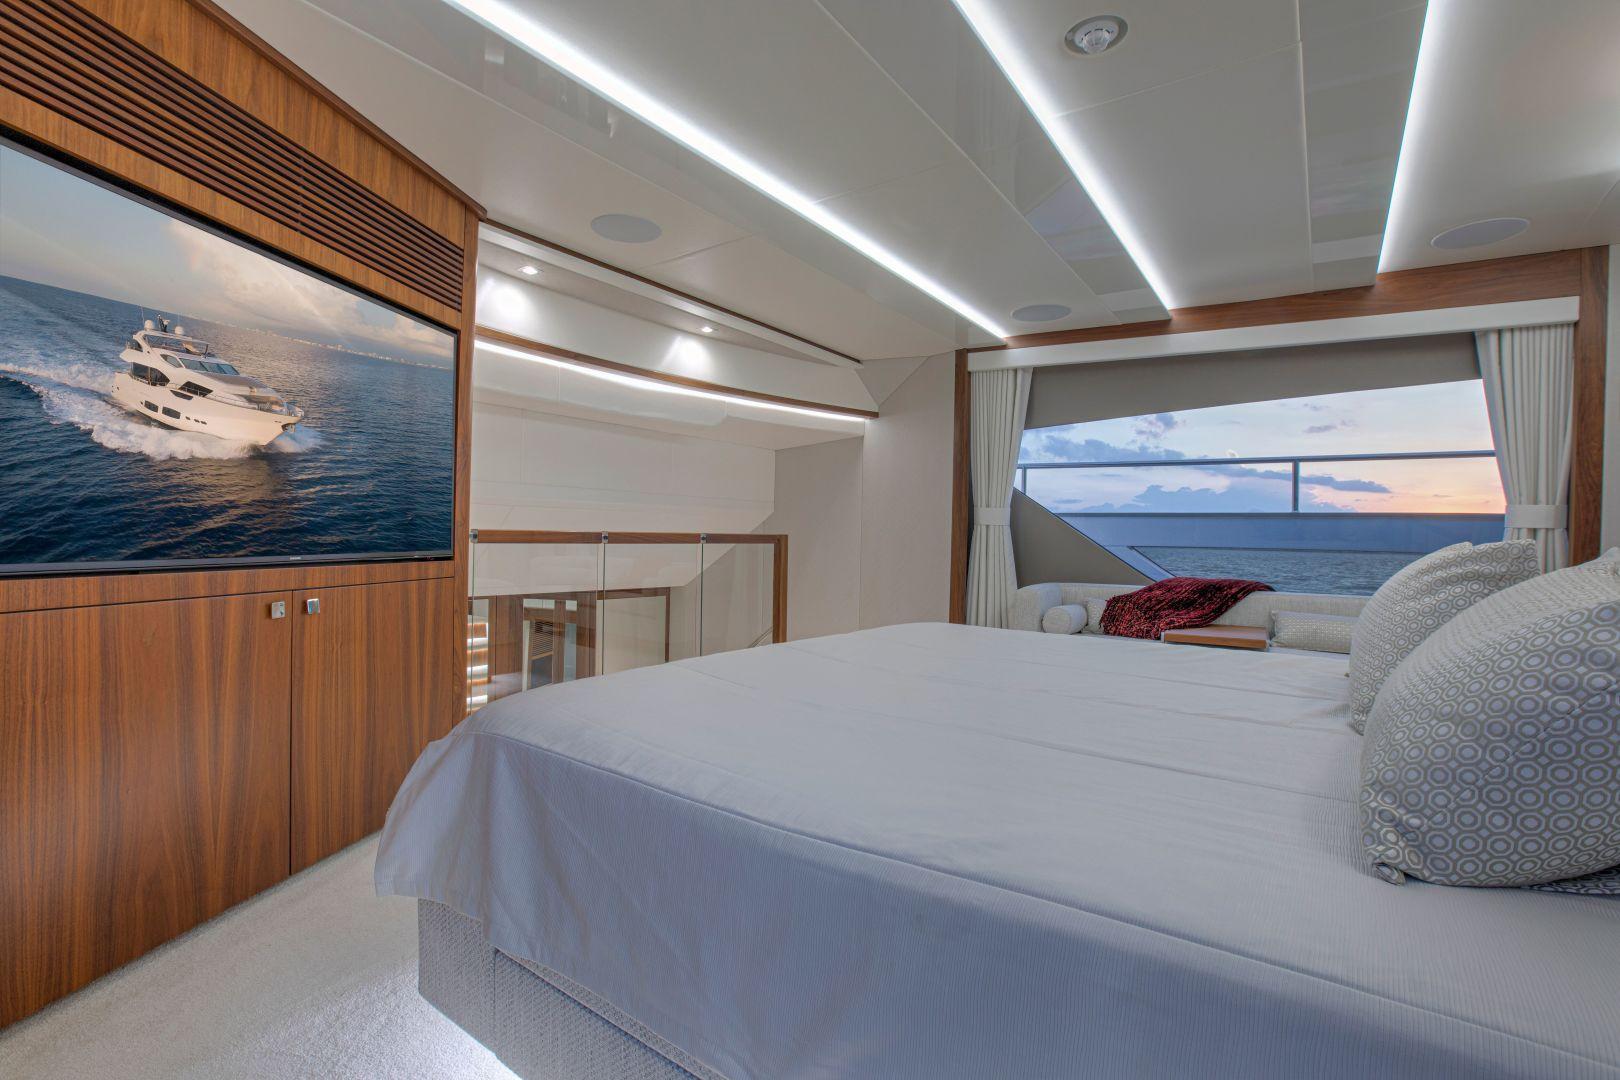 Sunseeker-95 Yacht 2017-Perseverance 3 Ft Lauderdale-Florida-United States-1400093   Thumbnail